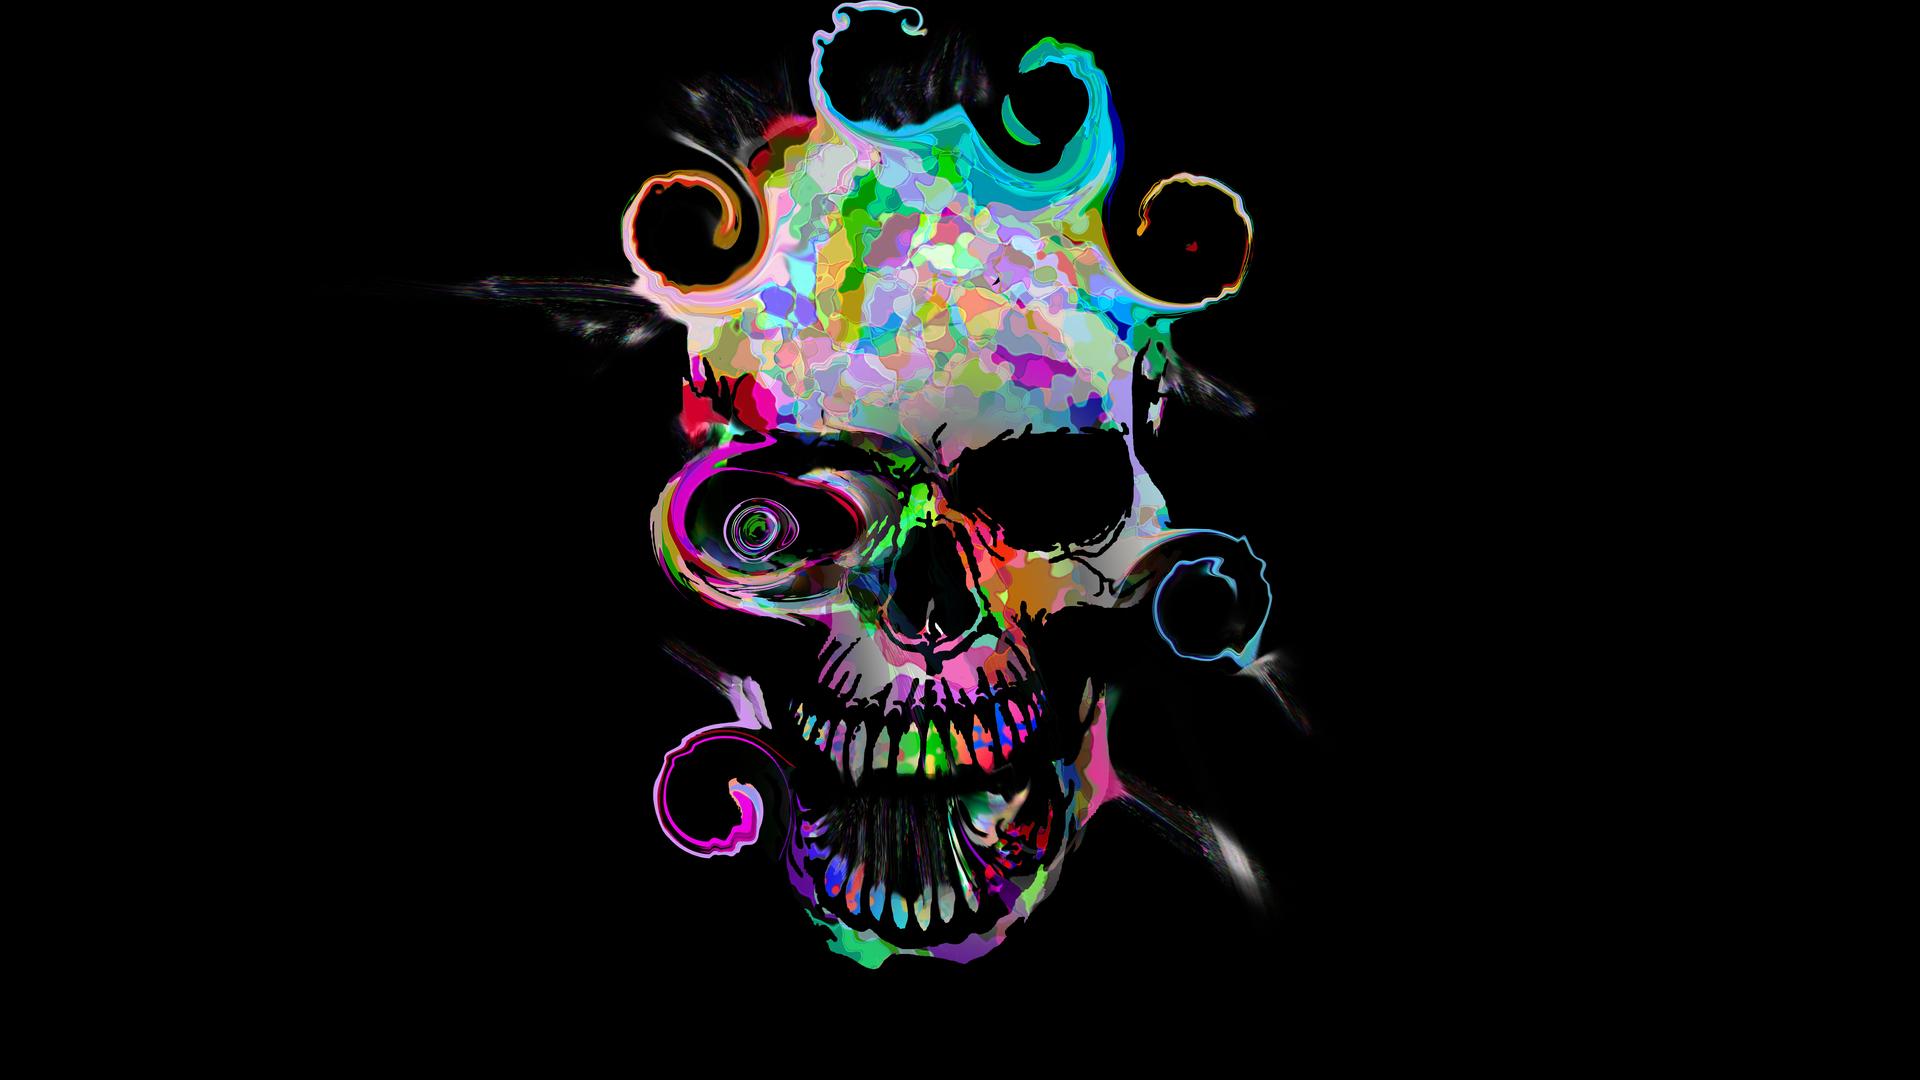 1920x1080 Artistic Colorful Skull Laptop Full HD 1080P HD ...